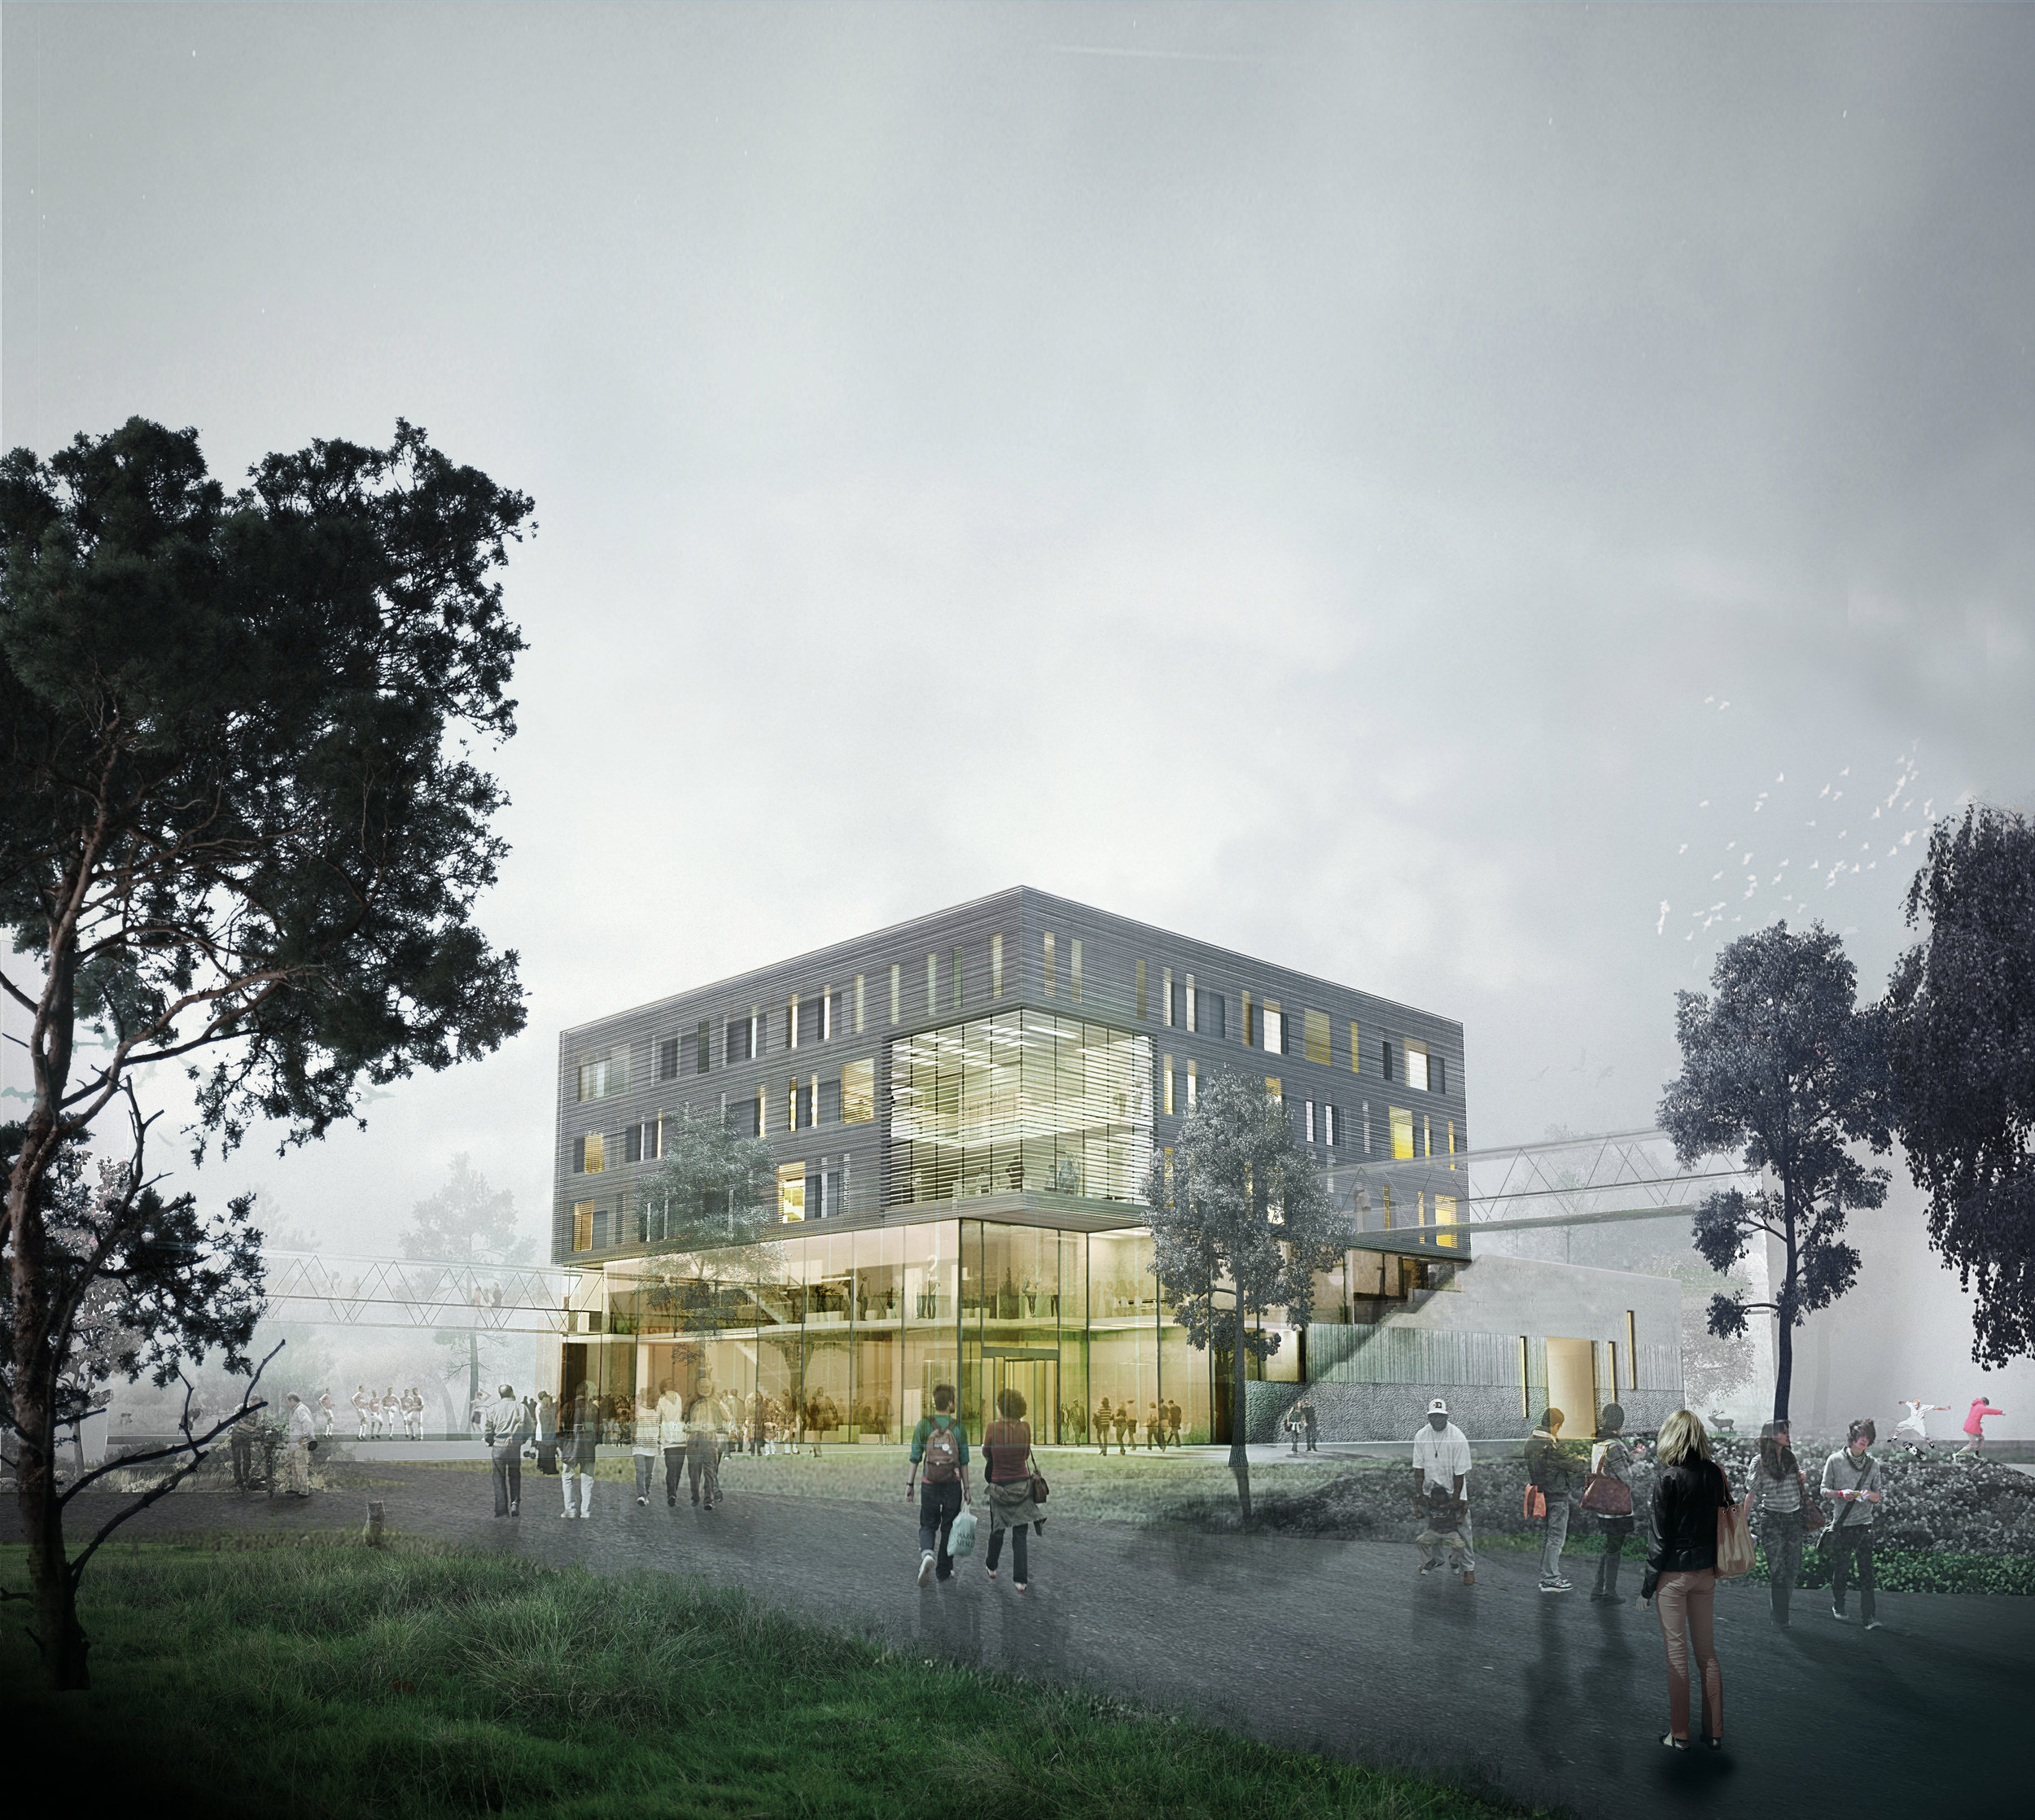 NTNU Gjøvik__Eksteriør@Reiulf Ramstad Arkitekter AS.jpg